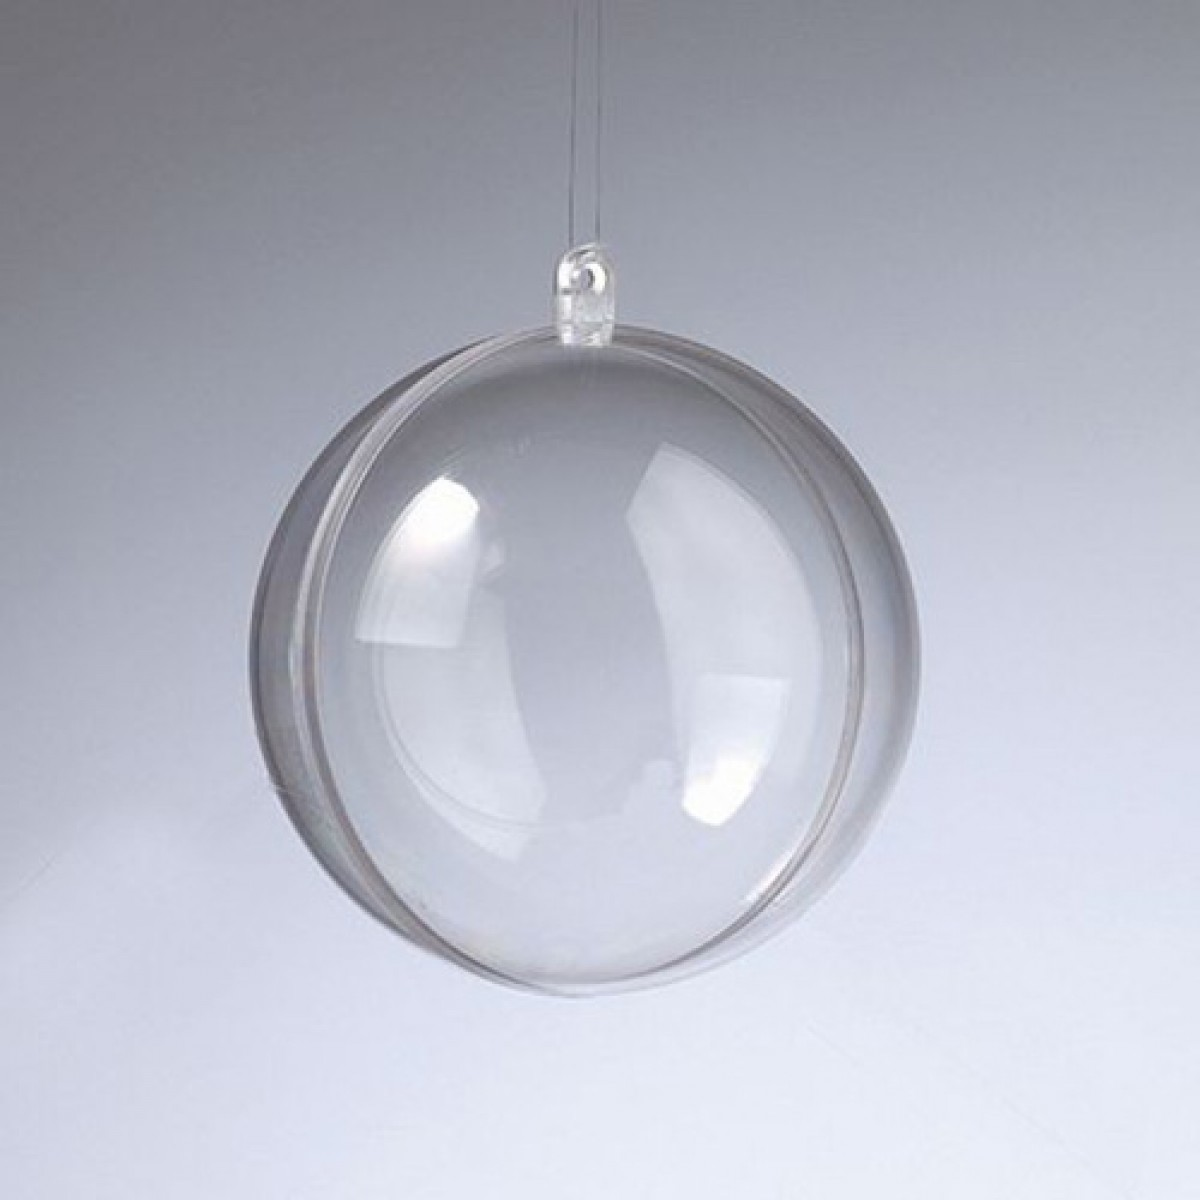 Efco Πλαστική Μπάλα Διάφανη 100mm Υλικά Χειροτεχνίας